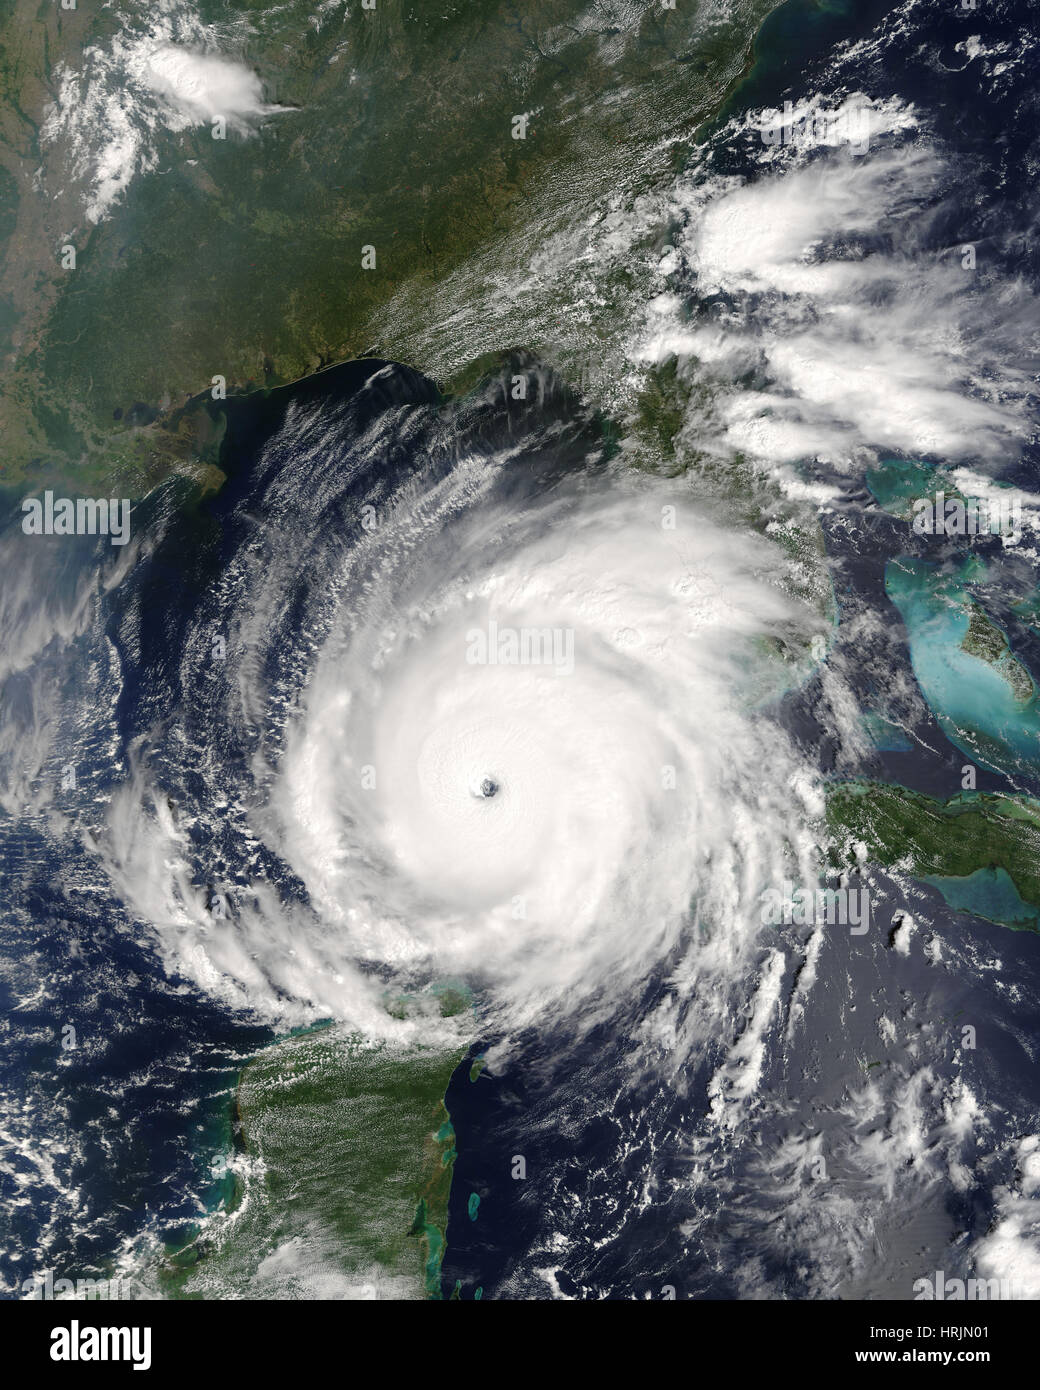 El Huracán Rita, MODIS Imagen, 2005 Imagen De Stock